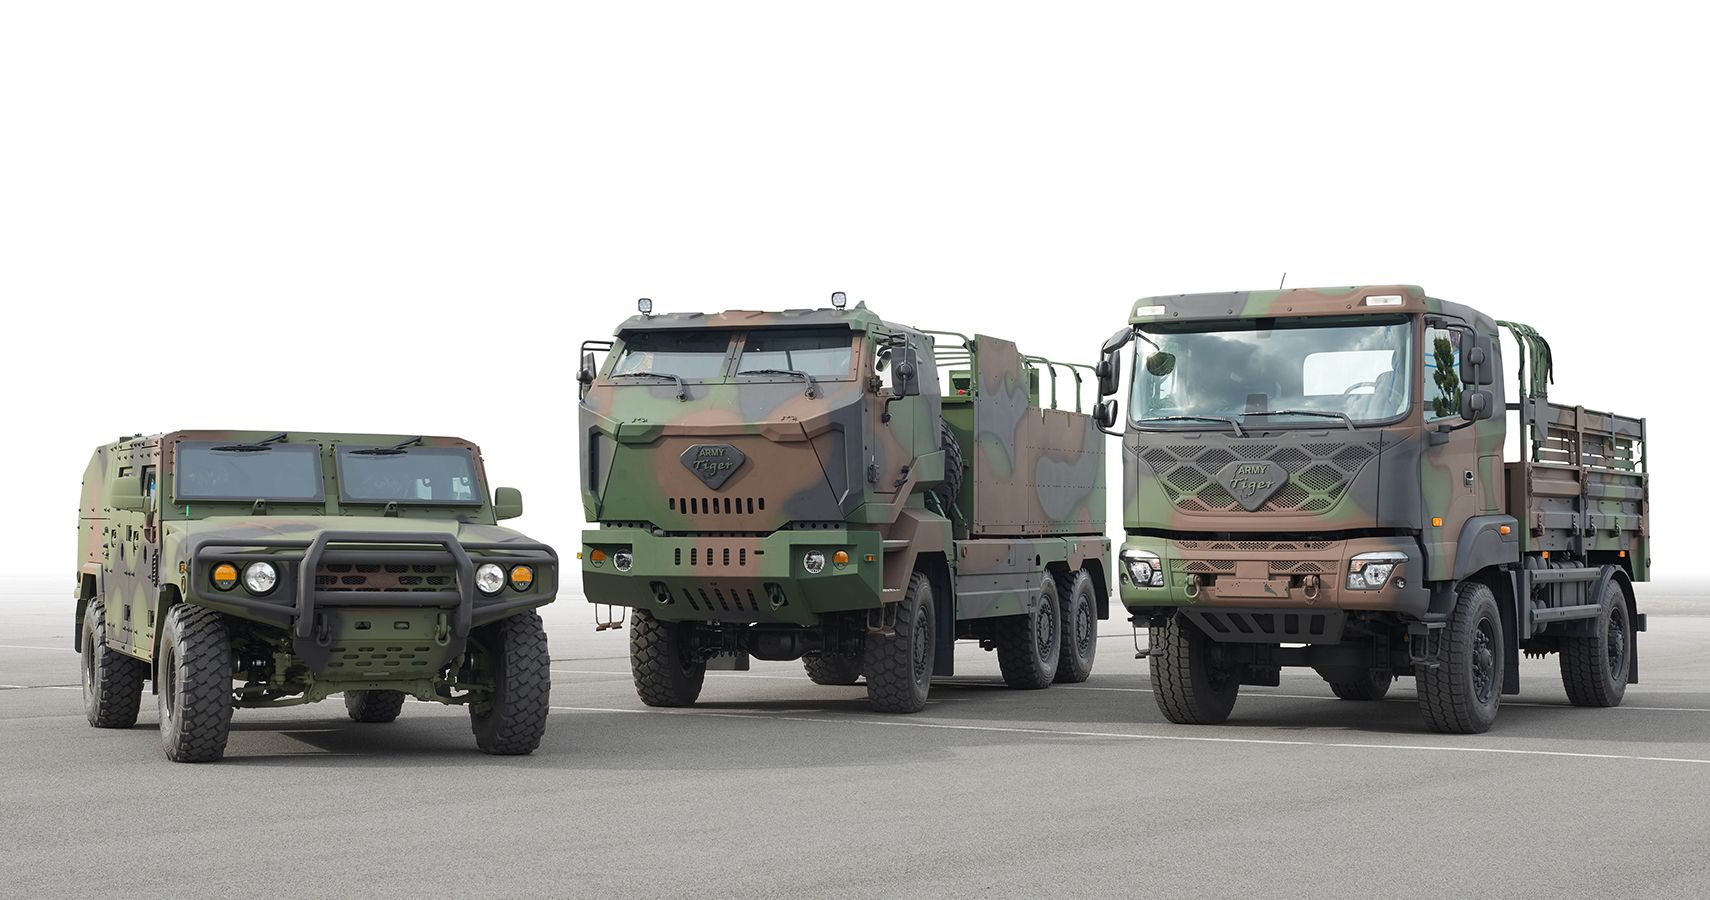 Kia Motors Developing A New Modular Platform For Its Next-Gen Military Vehicles